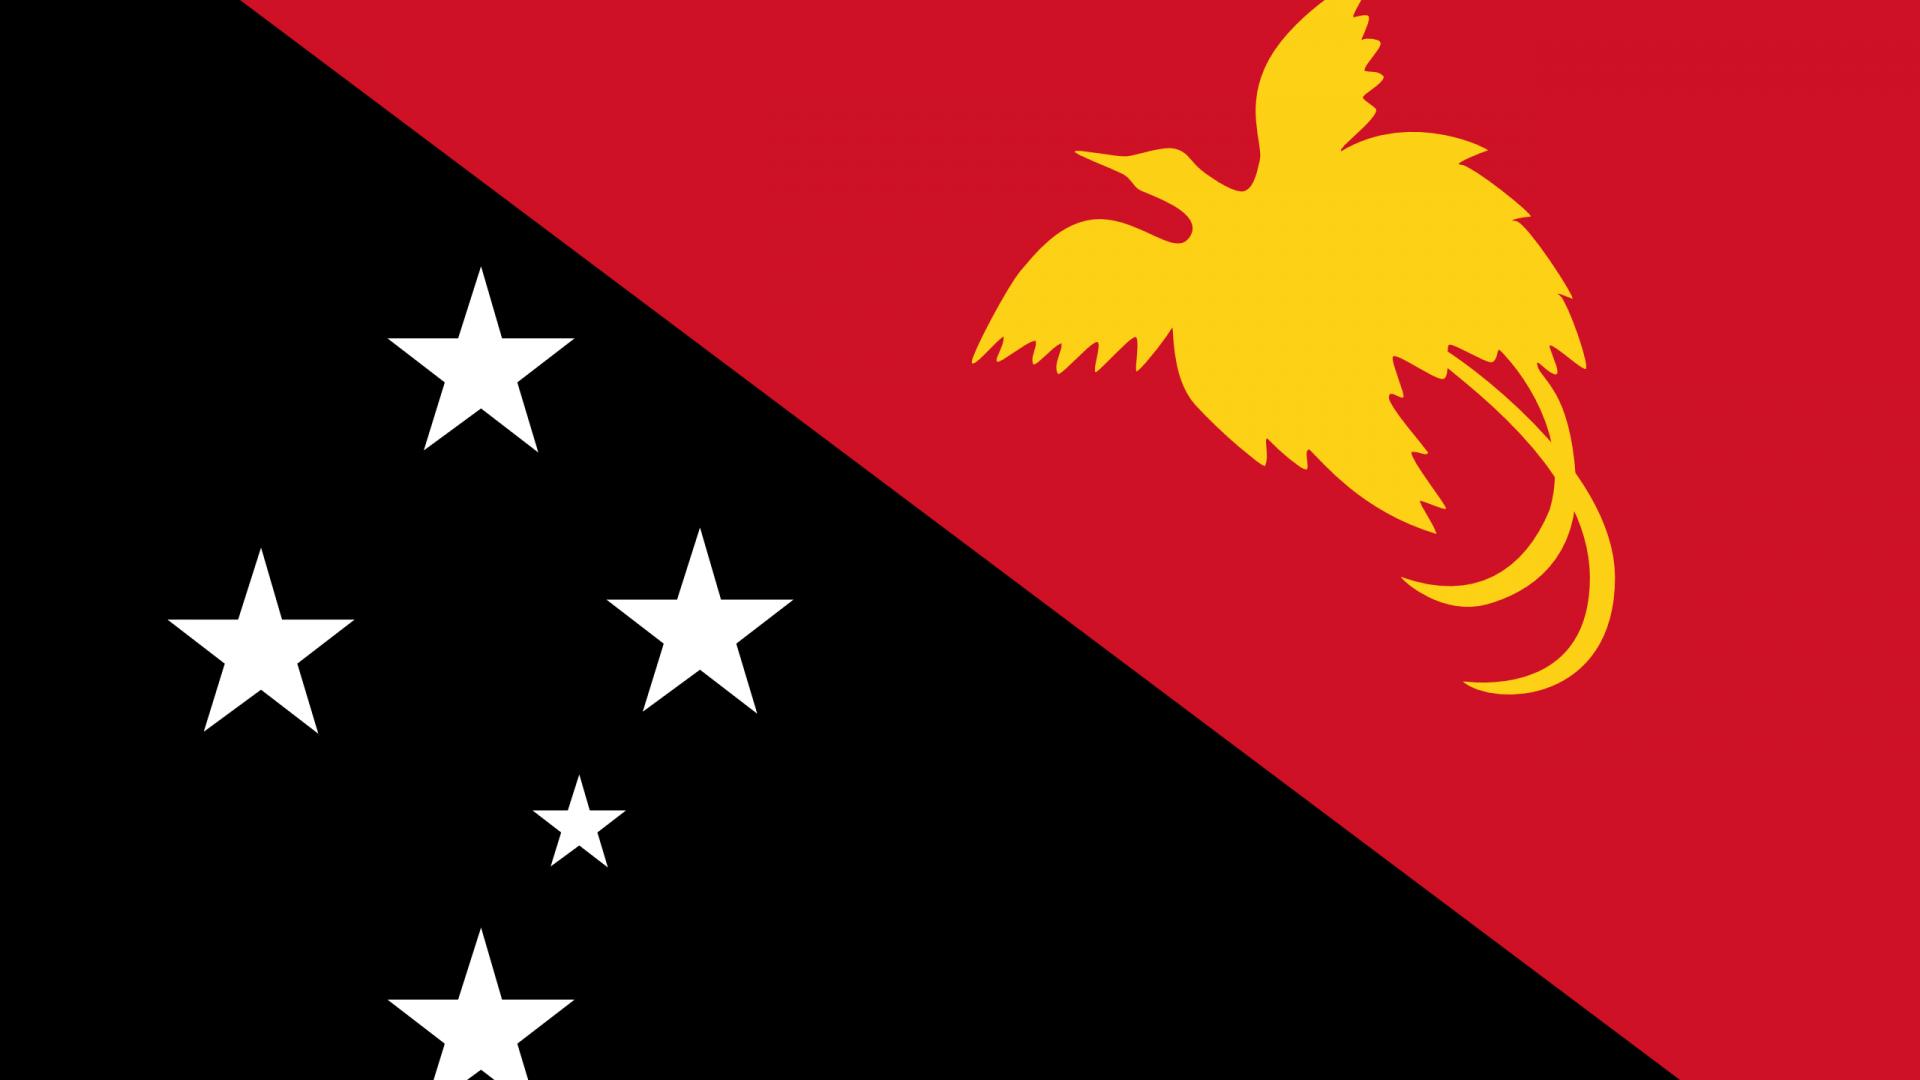 Papua New Guinea Flag   Wallpaper High Definition High Quality 1920x1080